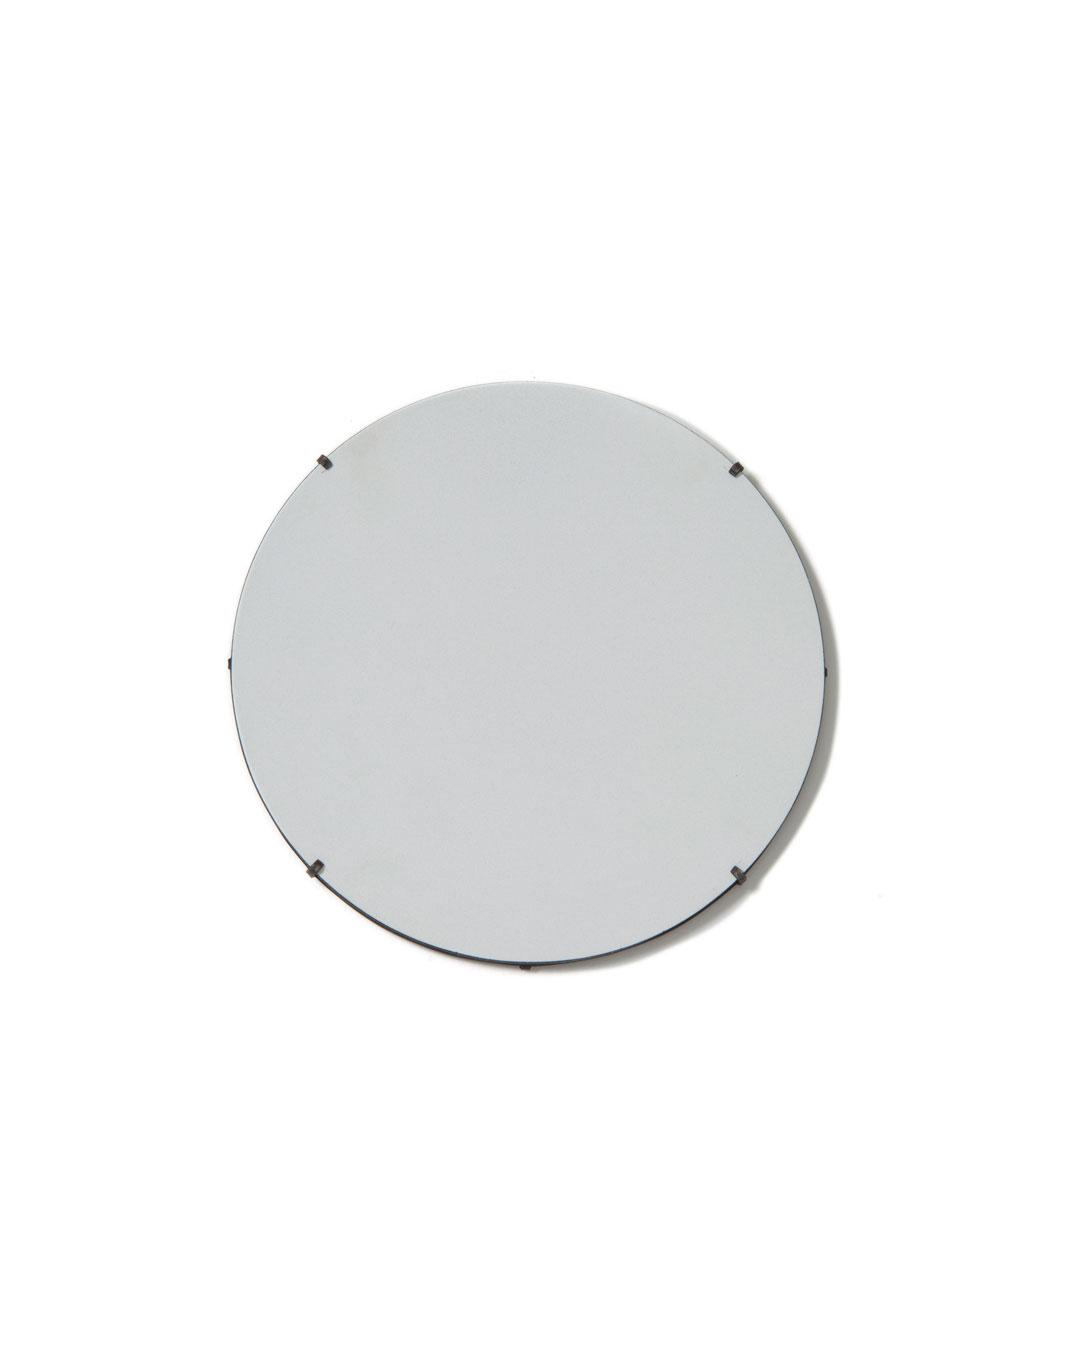 Florian Weichsberger, Warrior #6, 2016, brooch; steel, stainless steel, glass mirror, 120 x 120 x 7 mm, €1060